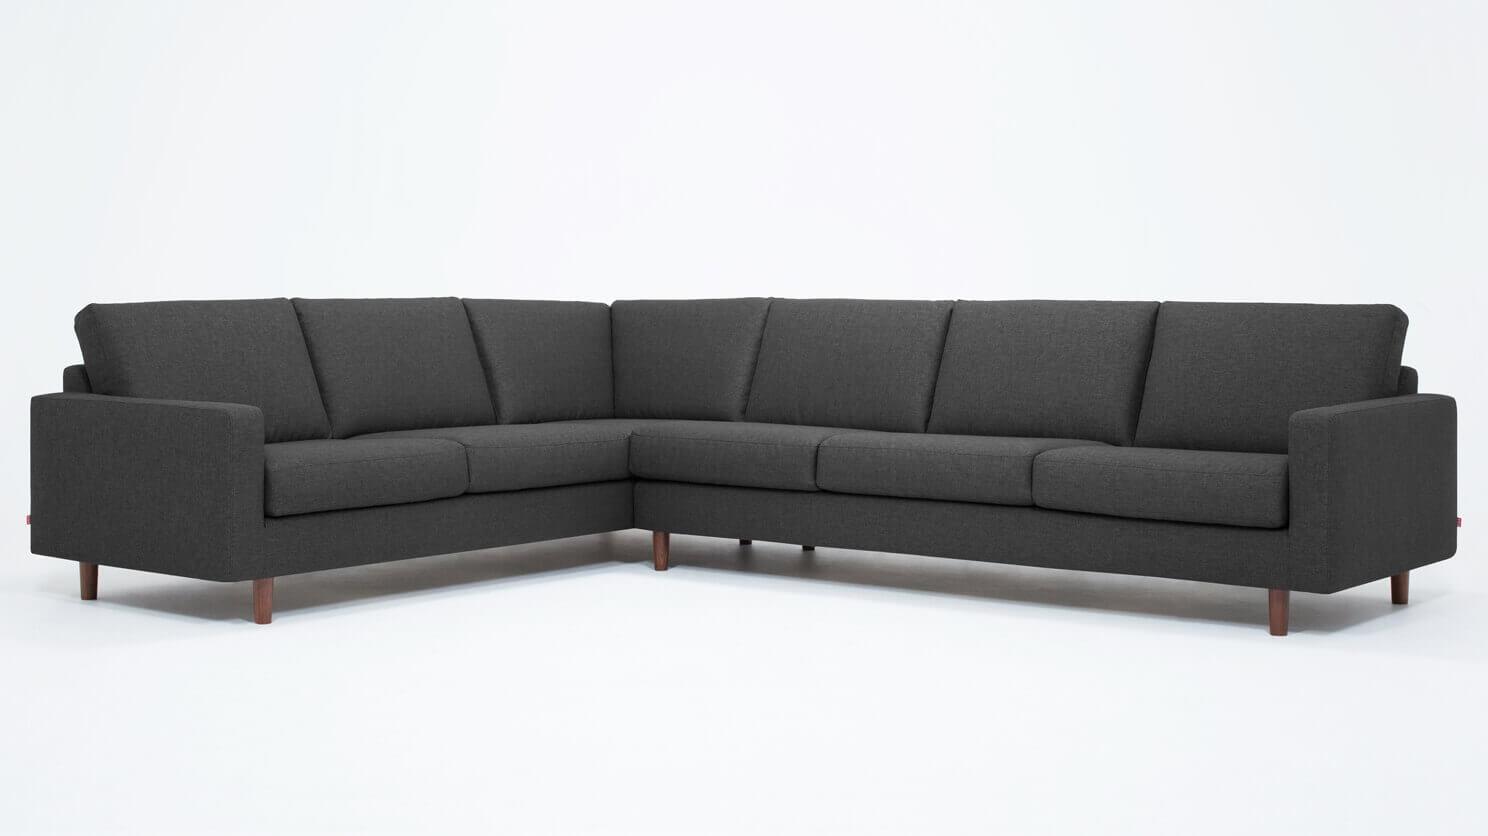 Oskar 2-Piece Sectional Sofa - Fabric | EQ3